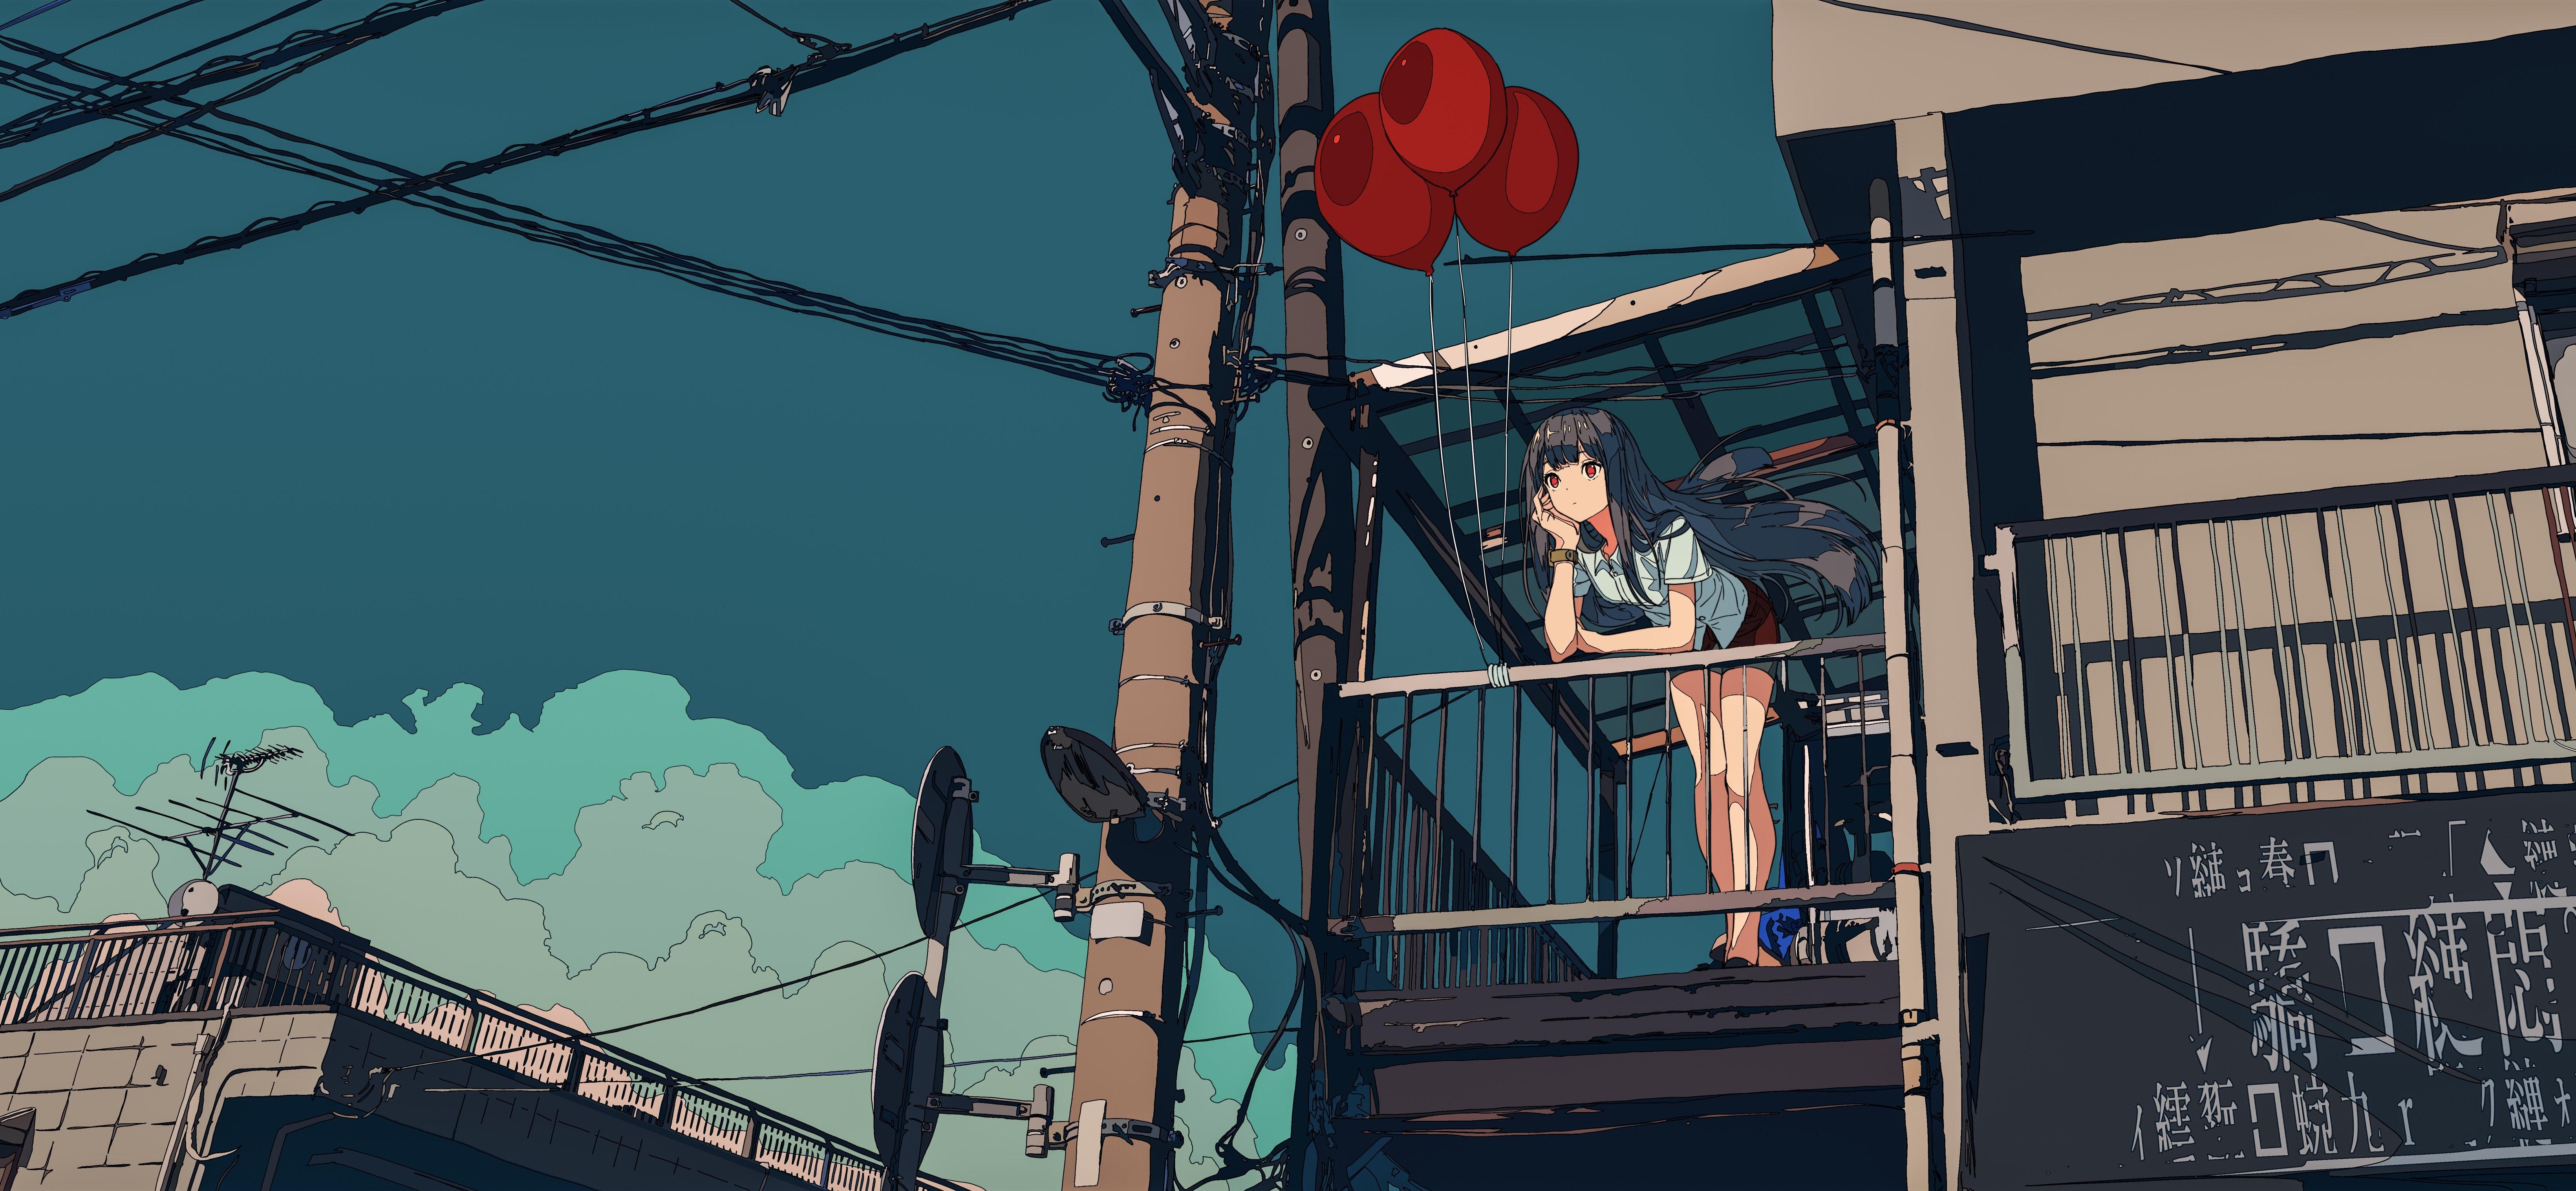 Anime 6560x3032 anime girls sky anime women long hair balloon bent over city urban red eyes Asia